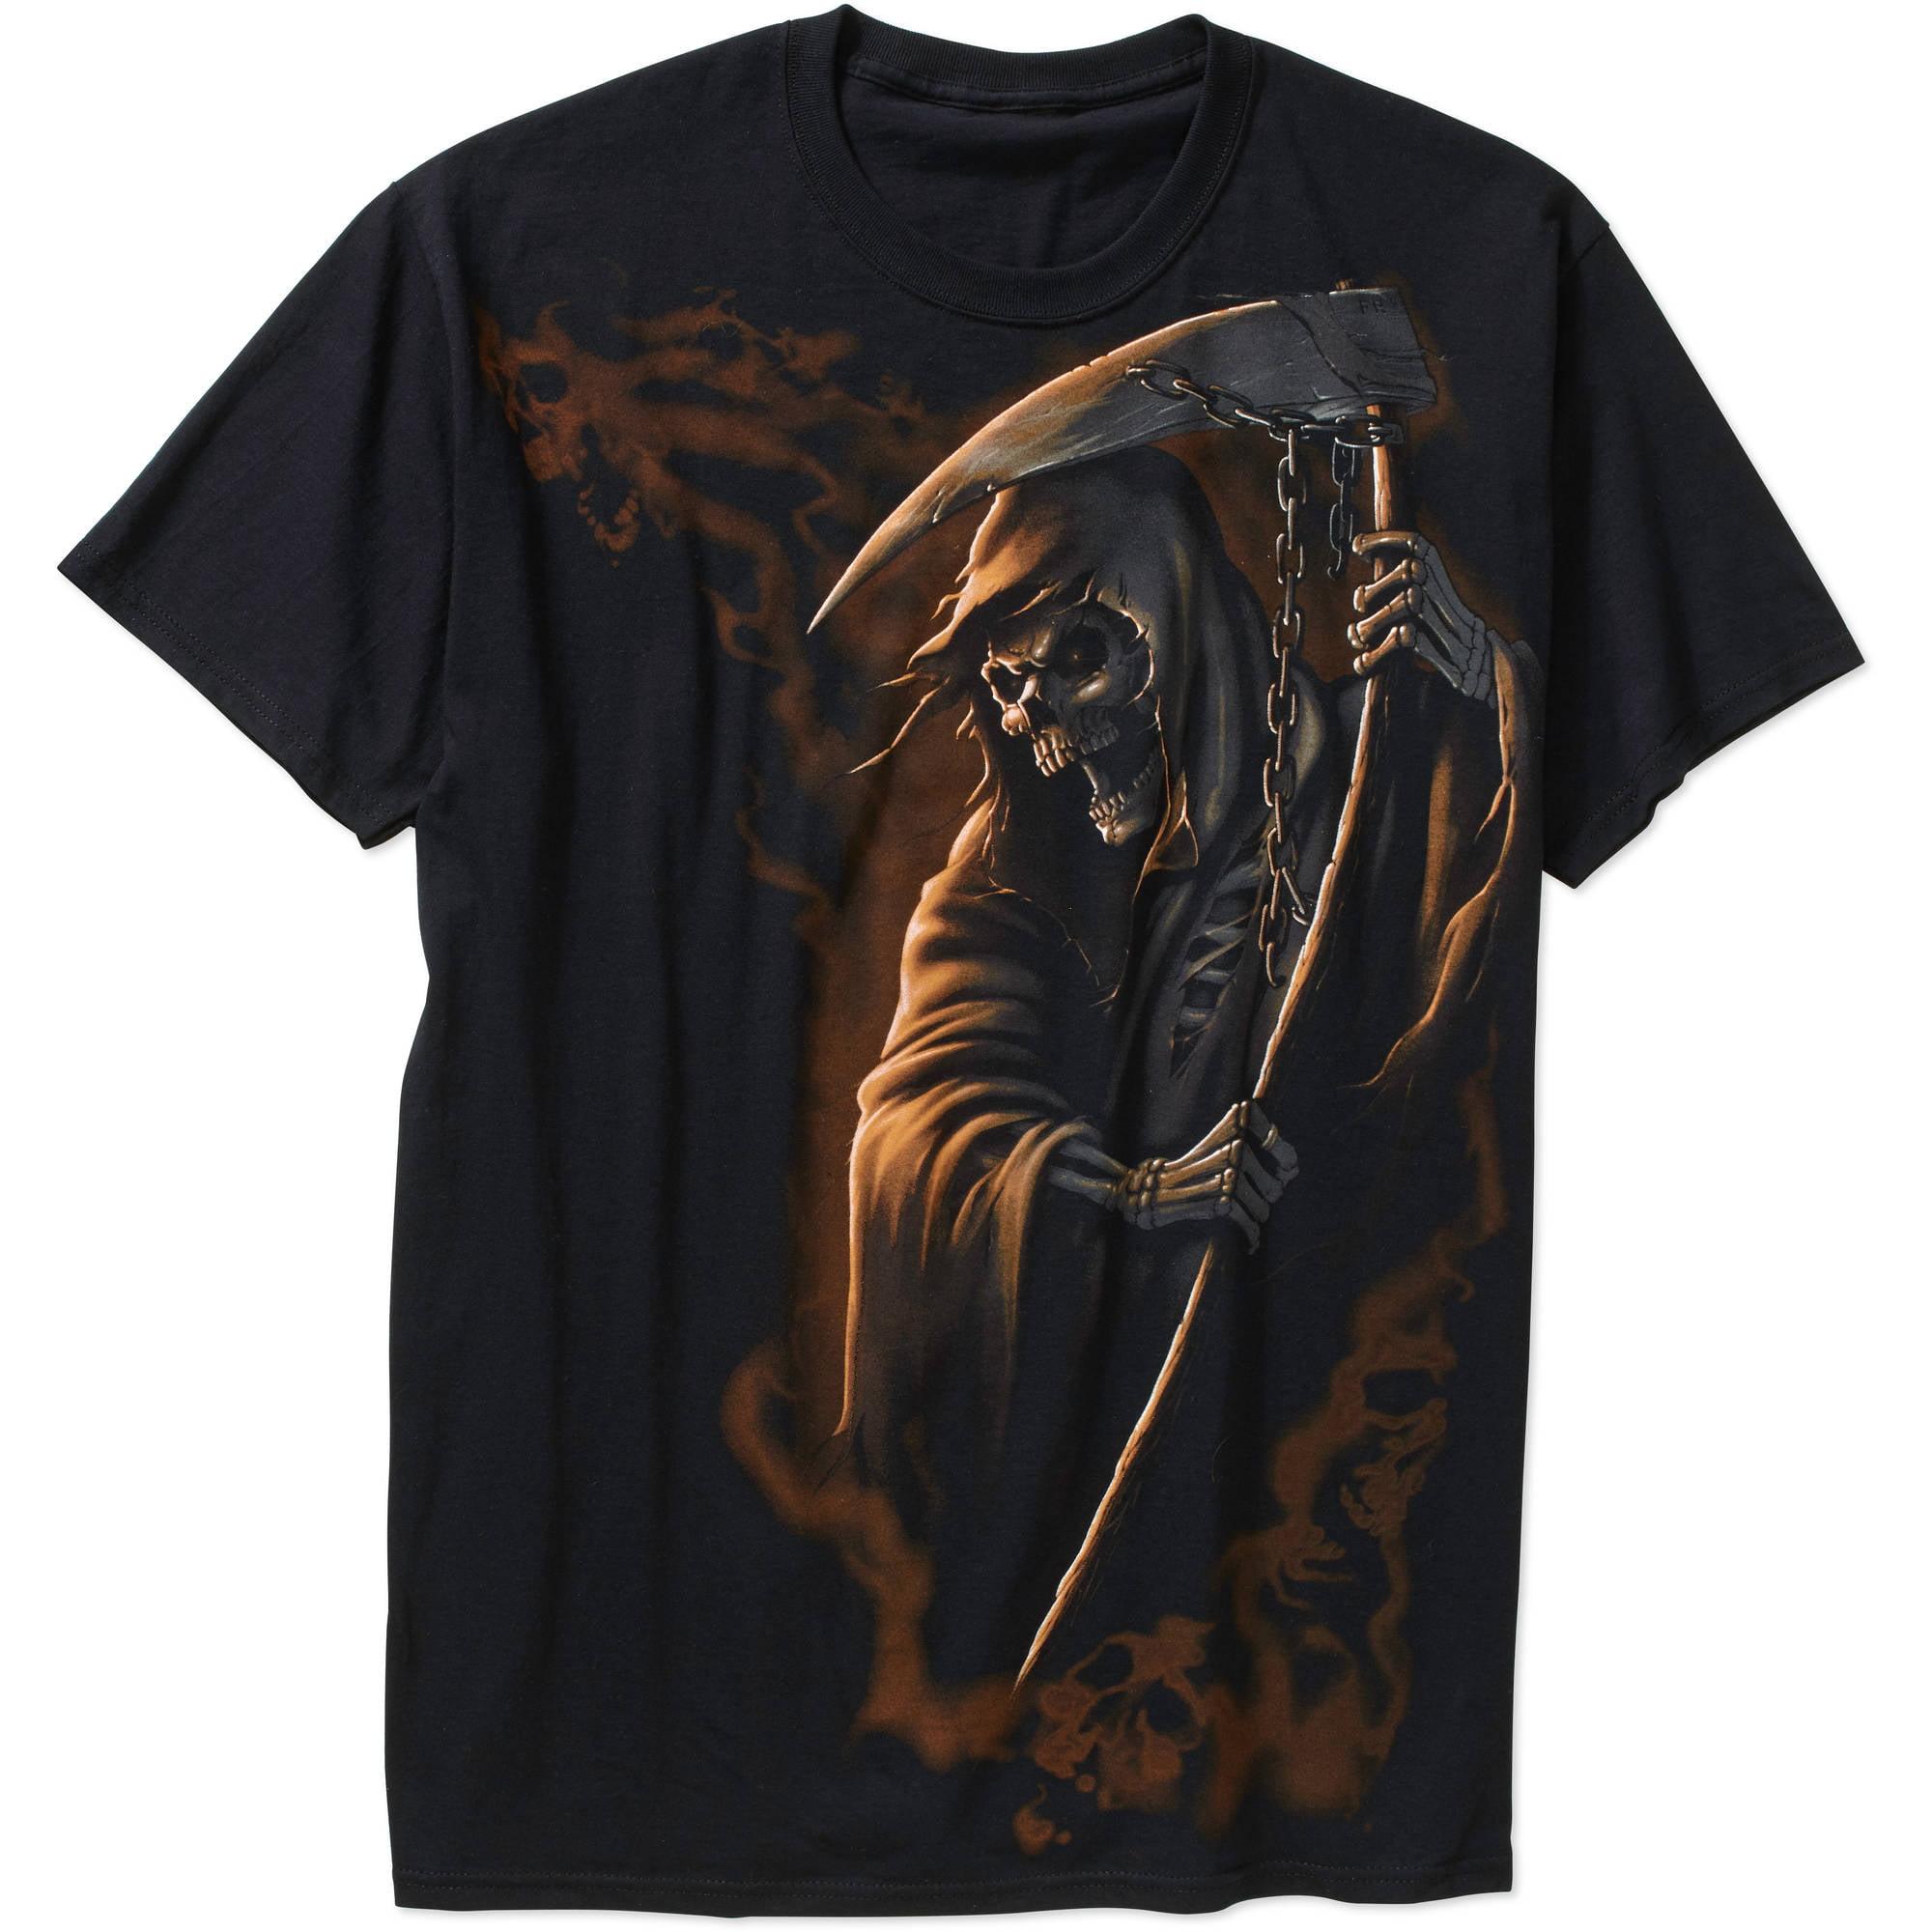 Reaper Smoke Men's Graphic Tee